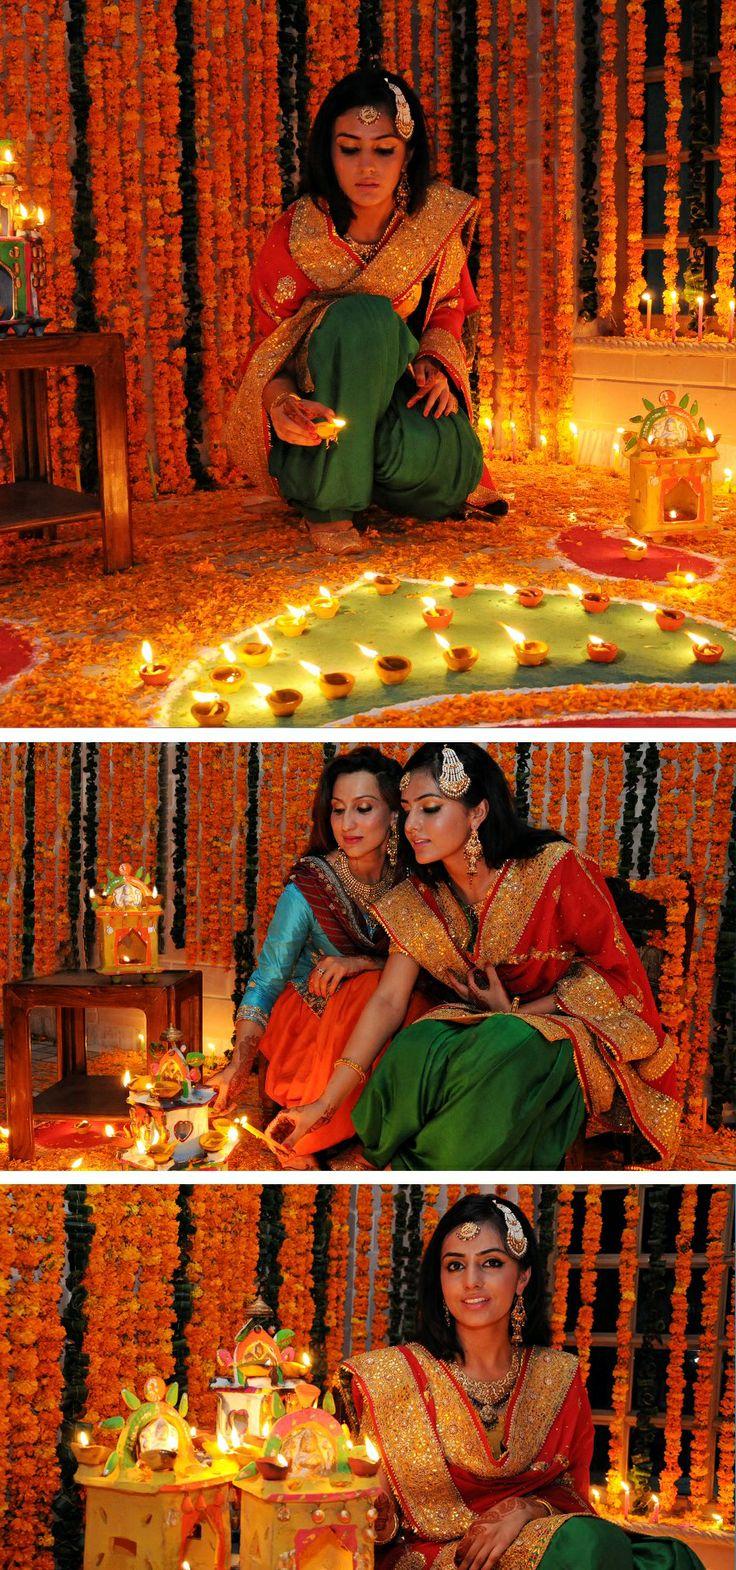 Mehndi celebrations in Pakistan